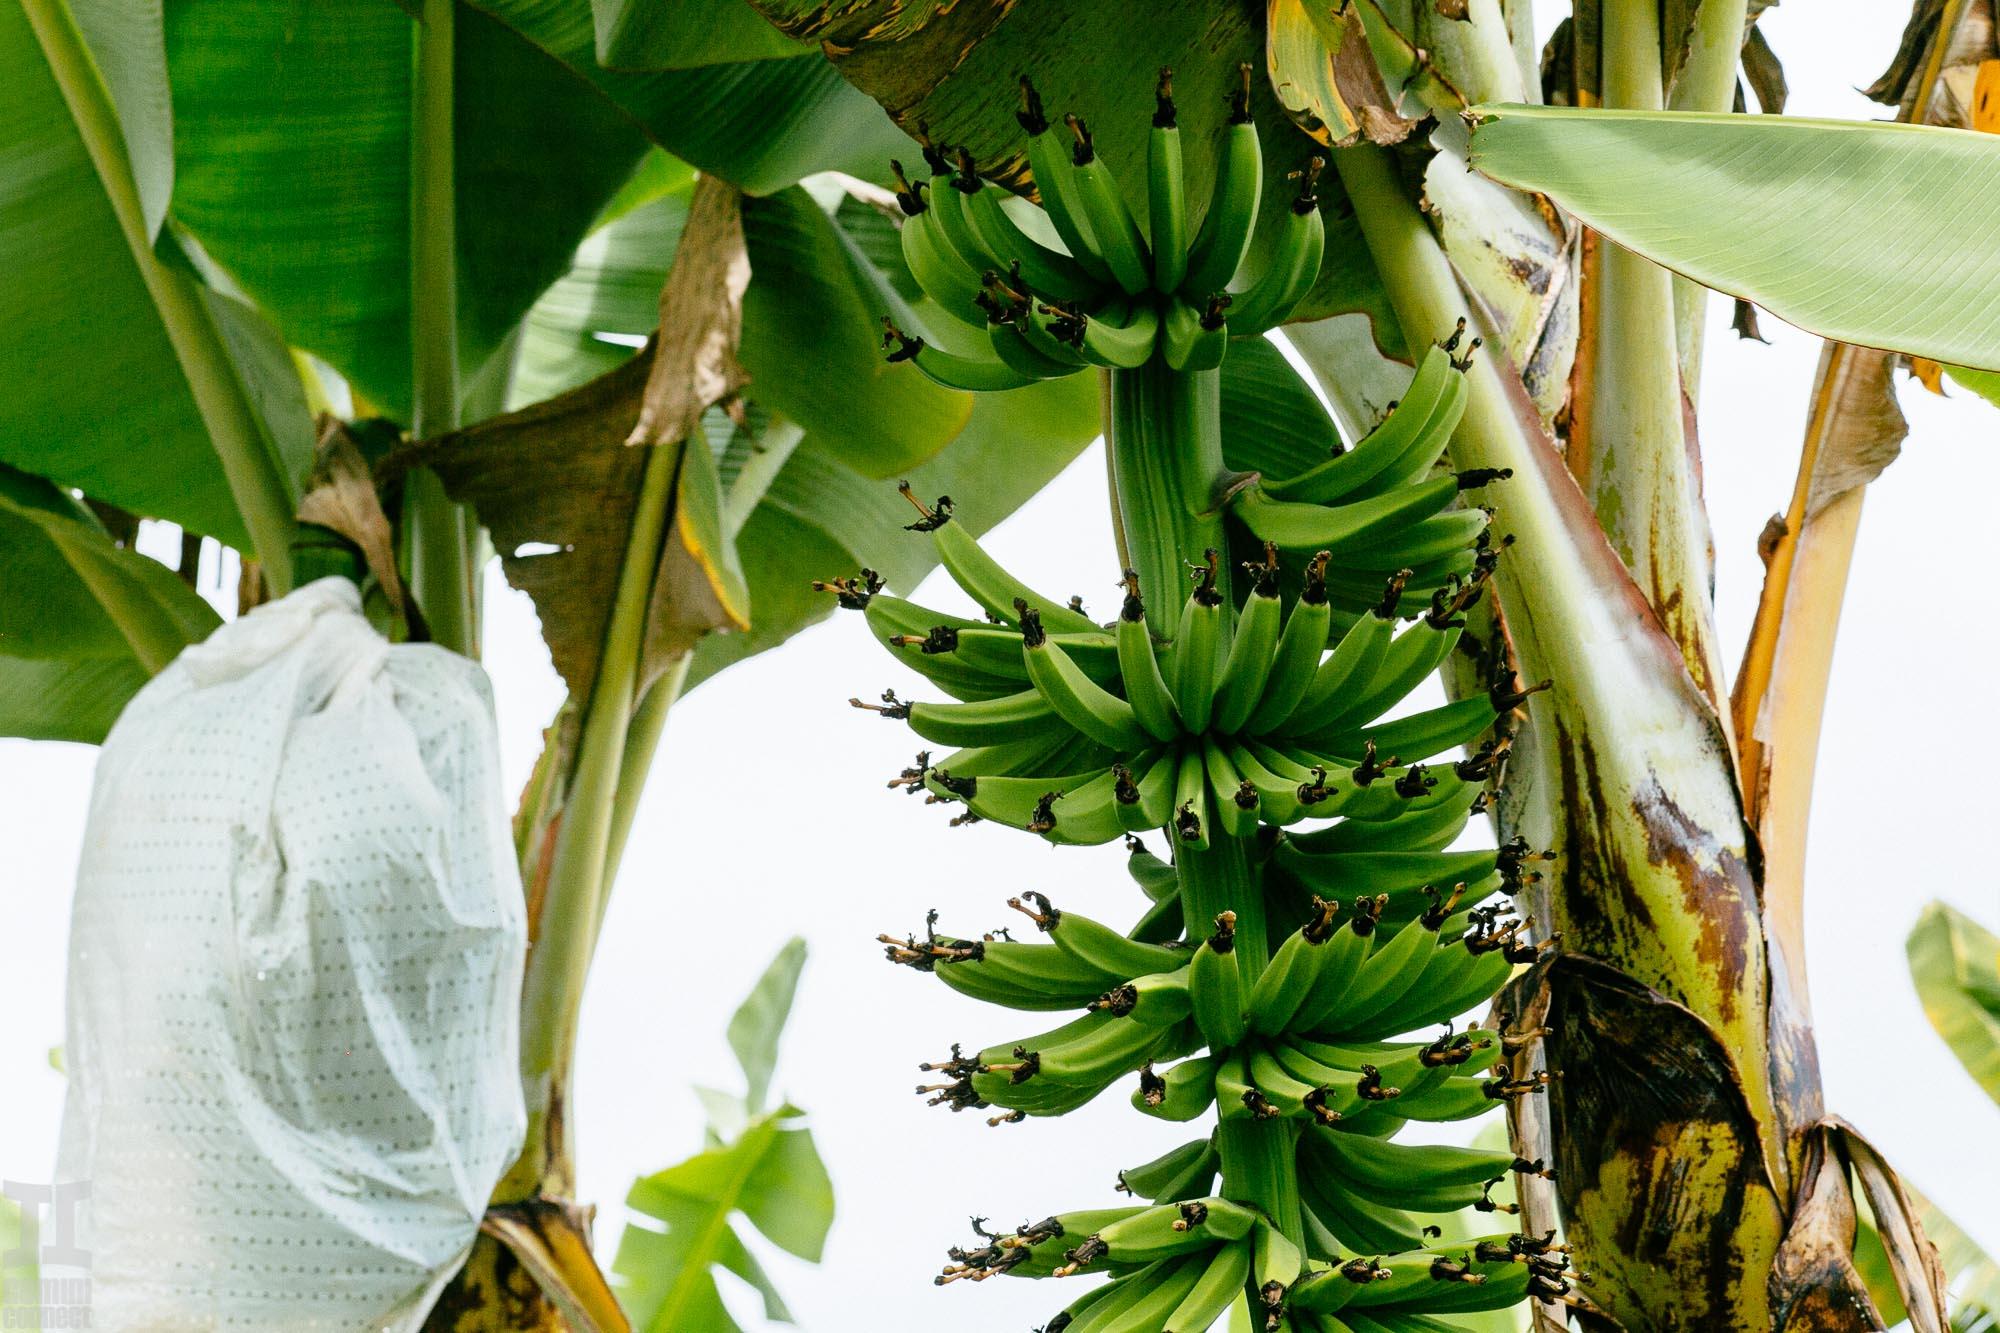 Hamakua-Bananas-8.jpg